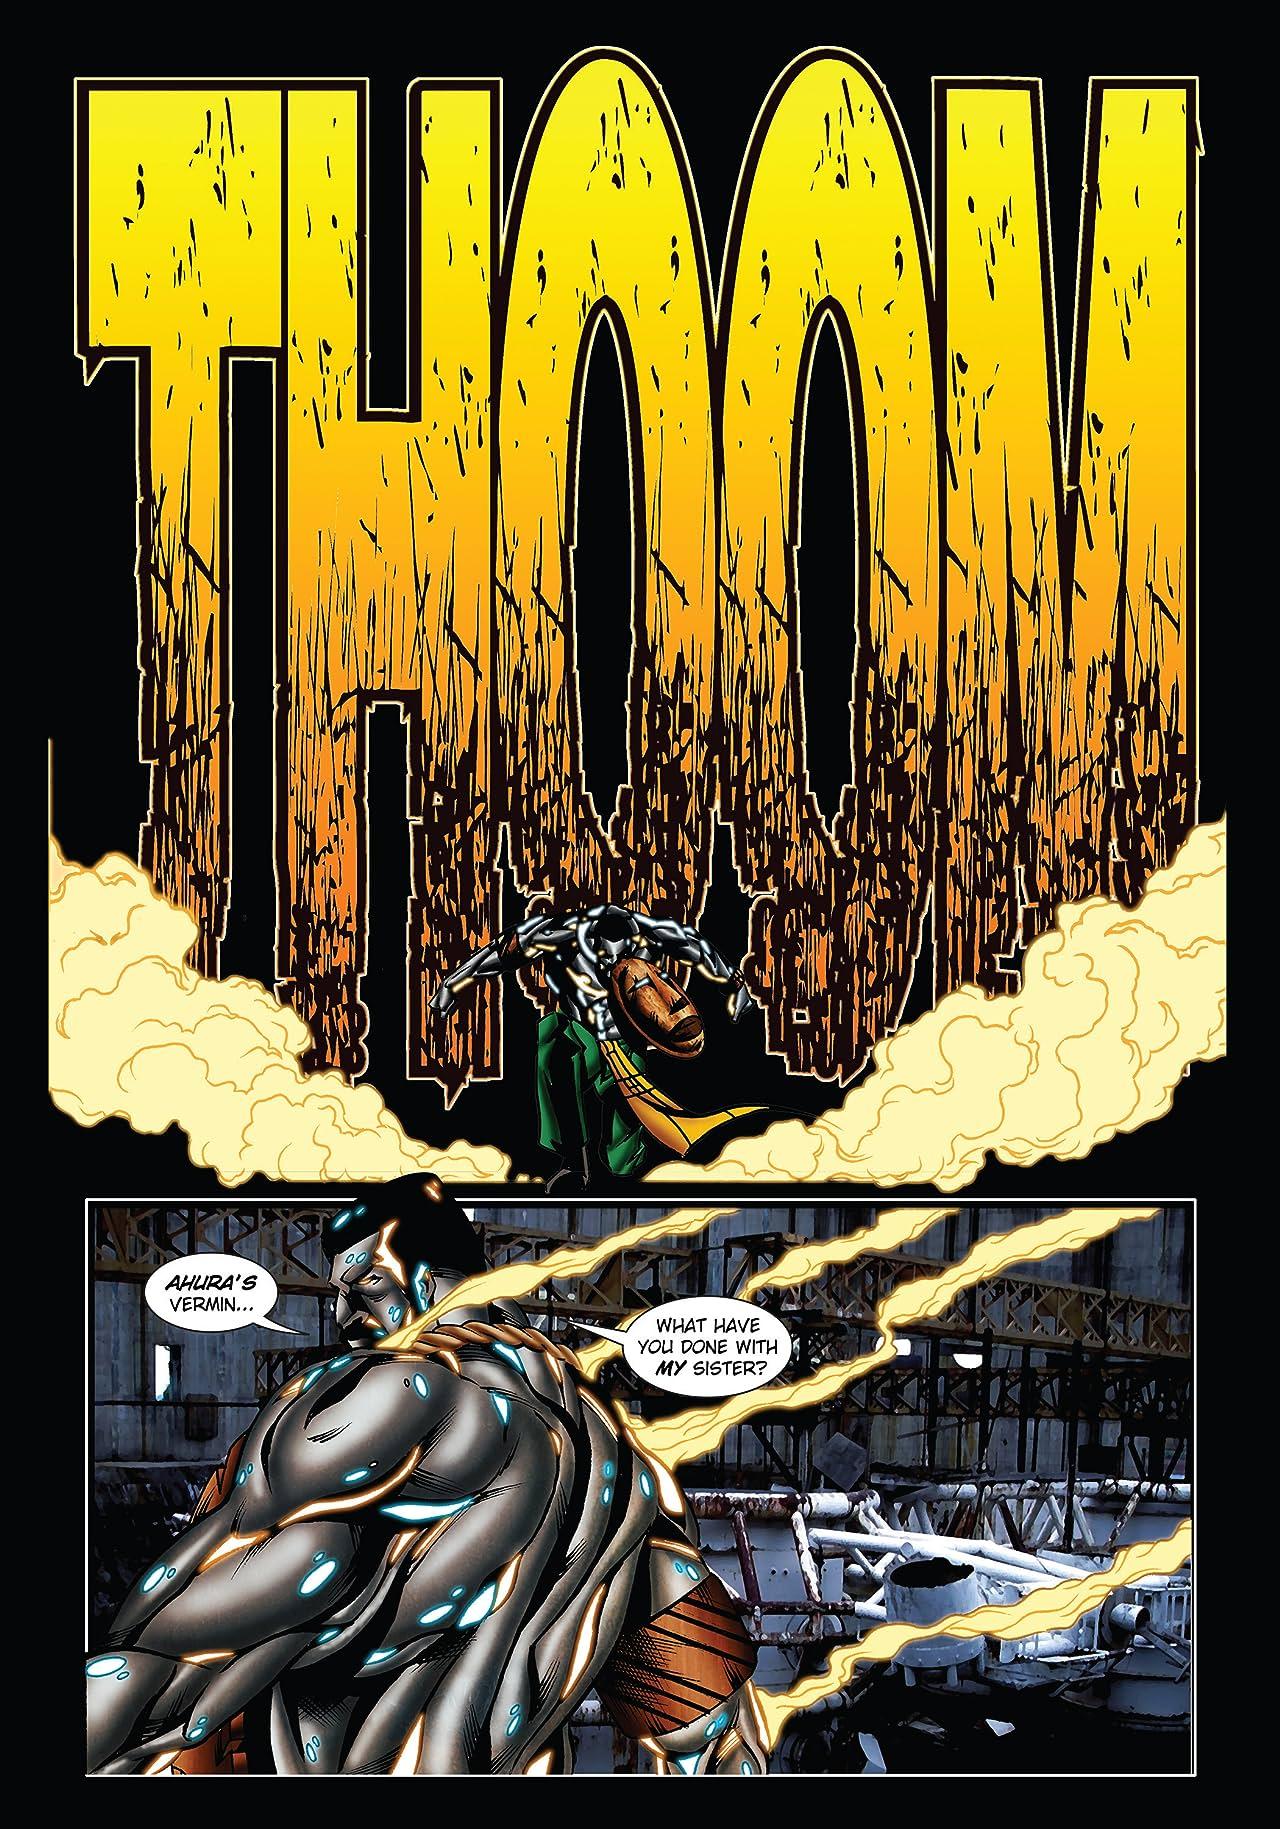 The Horsemen: Mark of the Cloven